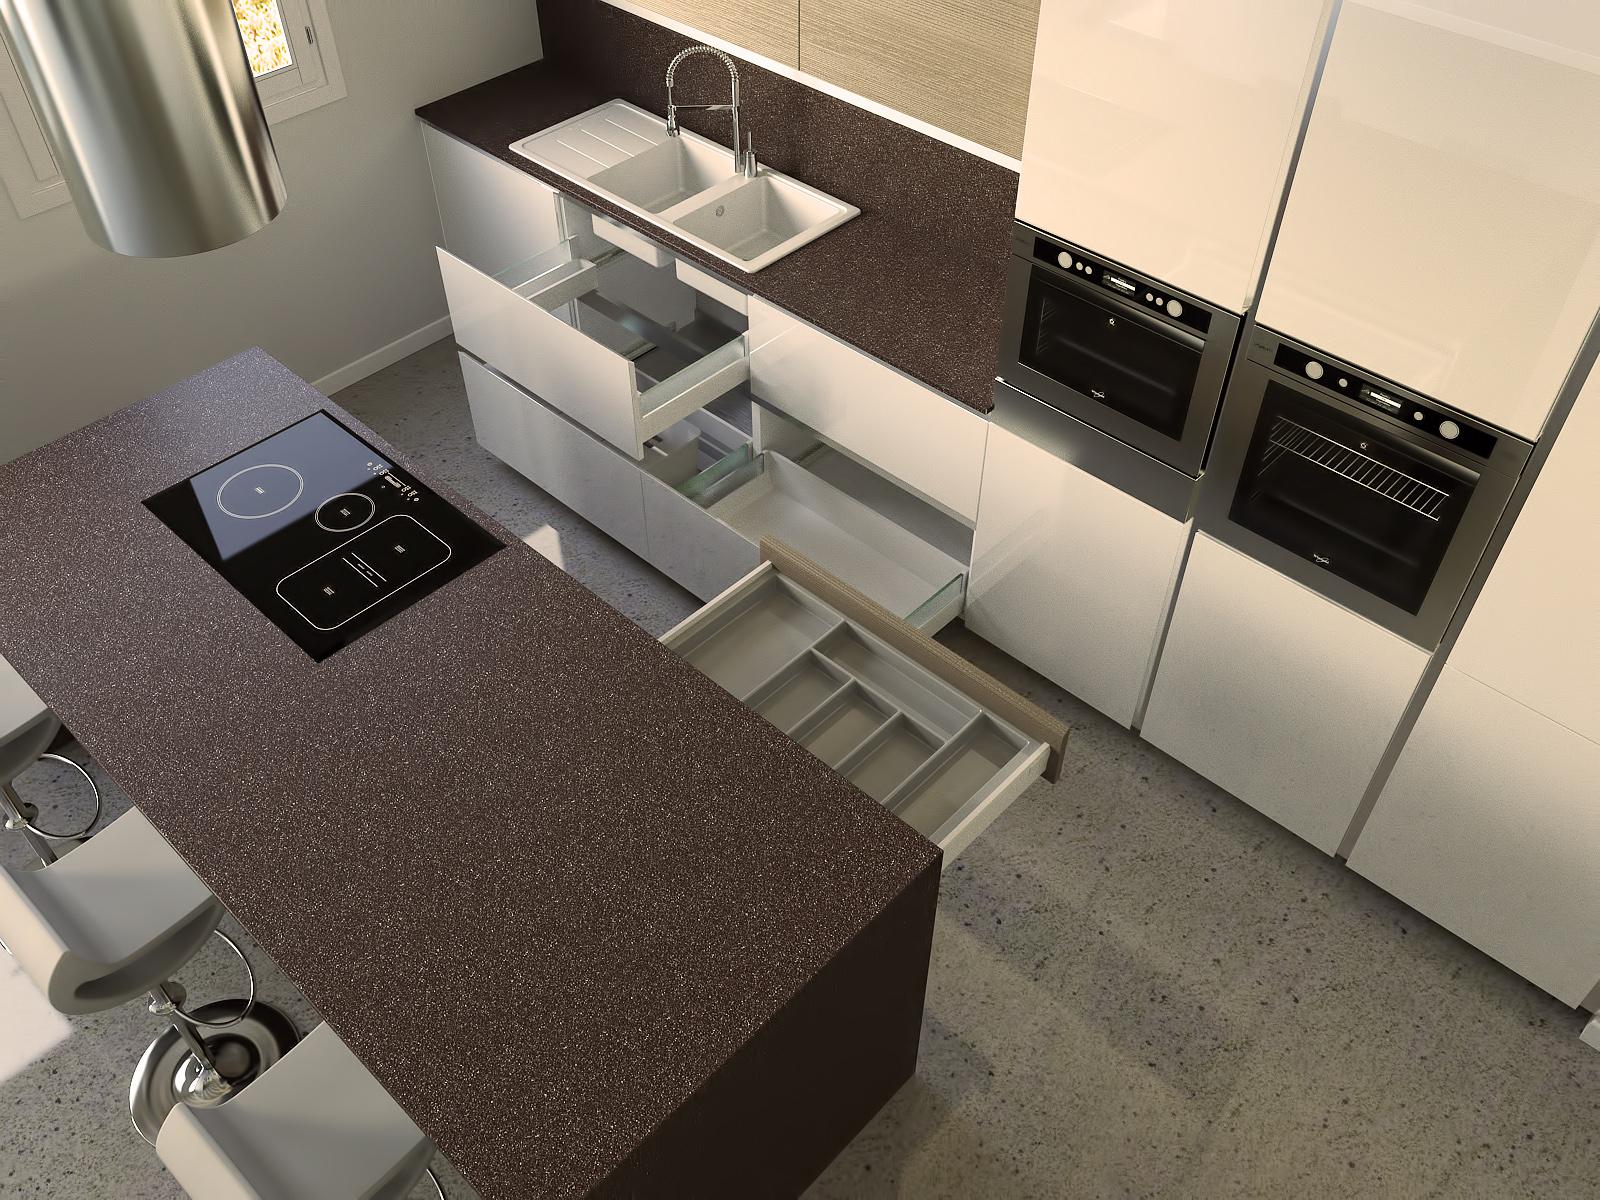 Cucina moderna final architettura e interior design - Top cucina porfido ...